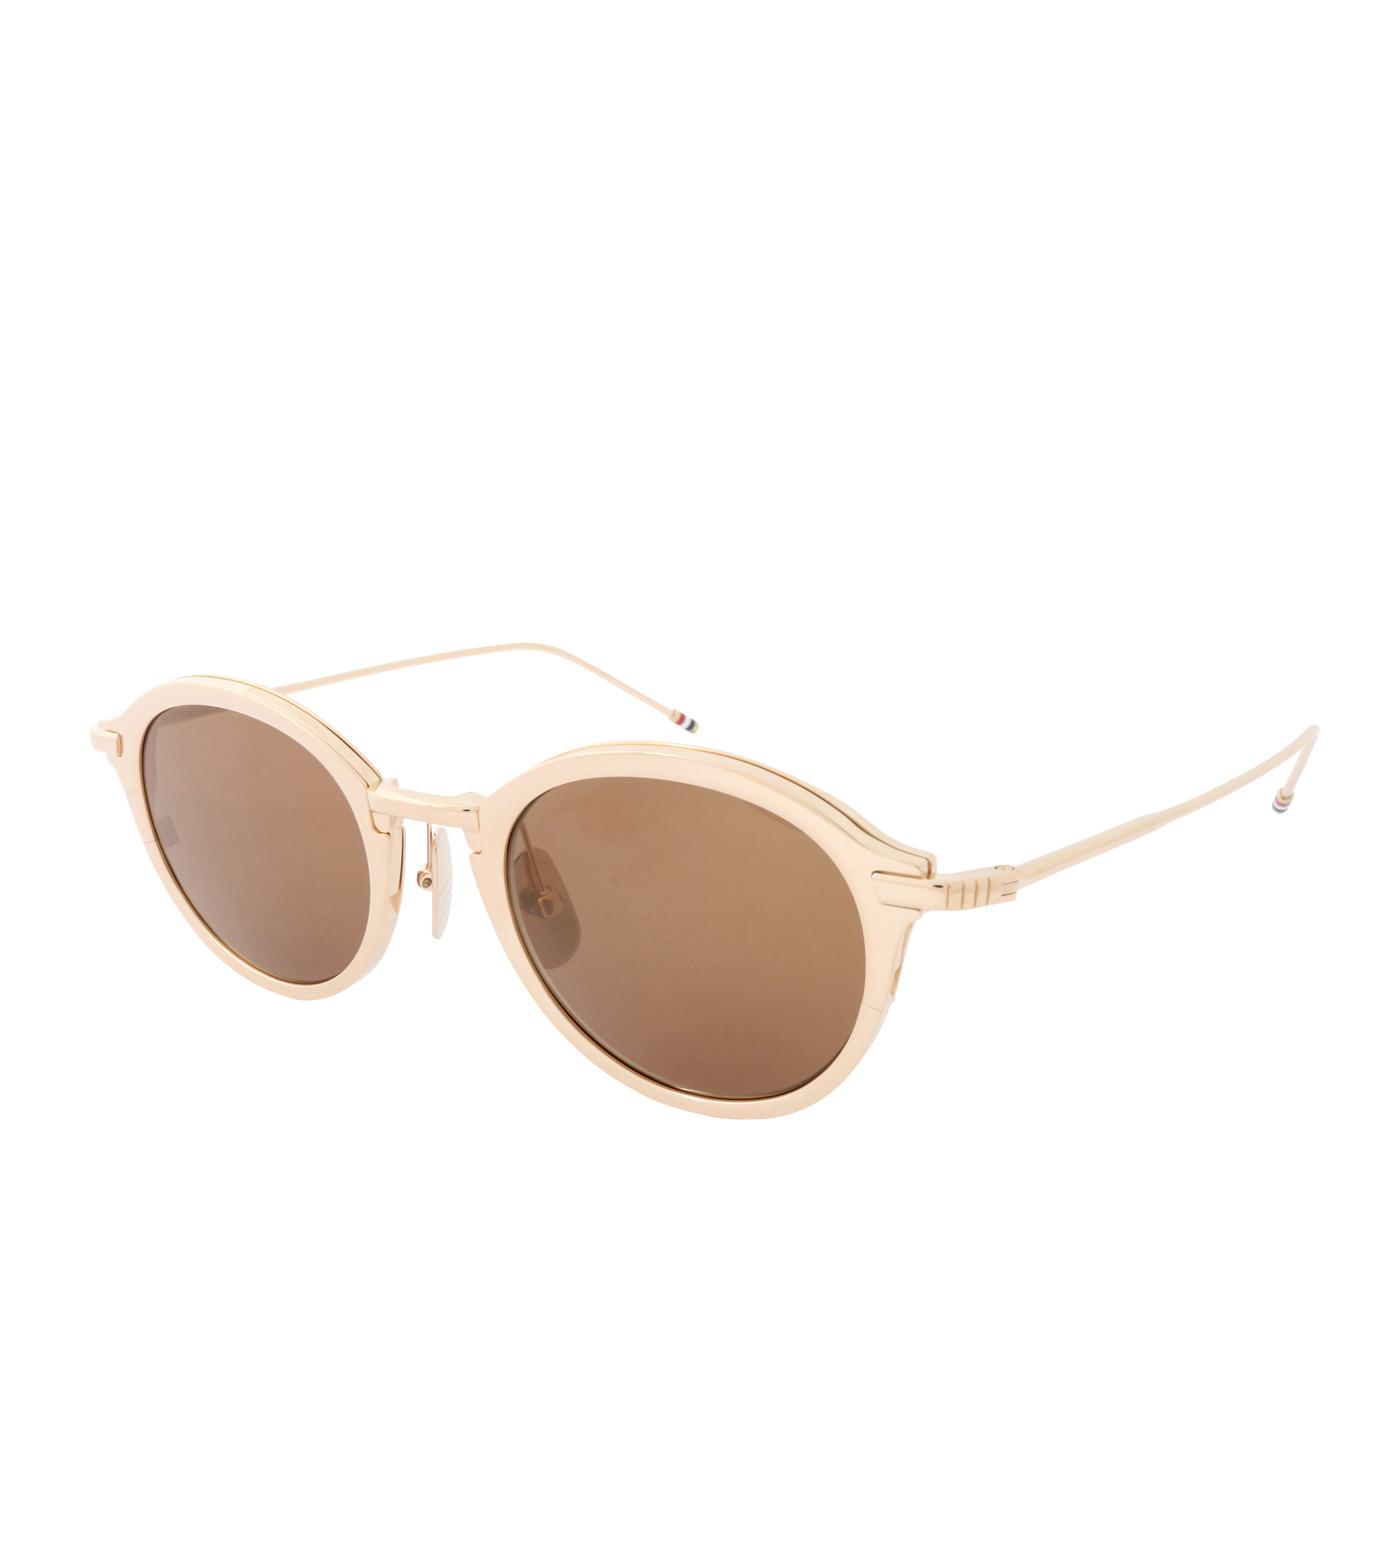 Thom Browne Eye Wear(トム・ブラウン・アイウェア)のRound Lens-GOLD(アイウェア/eyewear)-TB-110-C-T-2 拡大詳細画像1